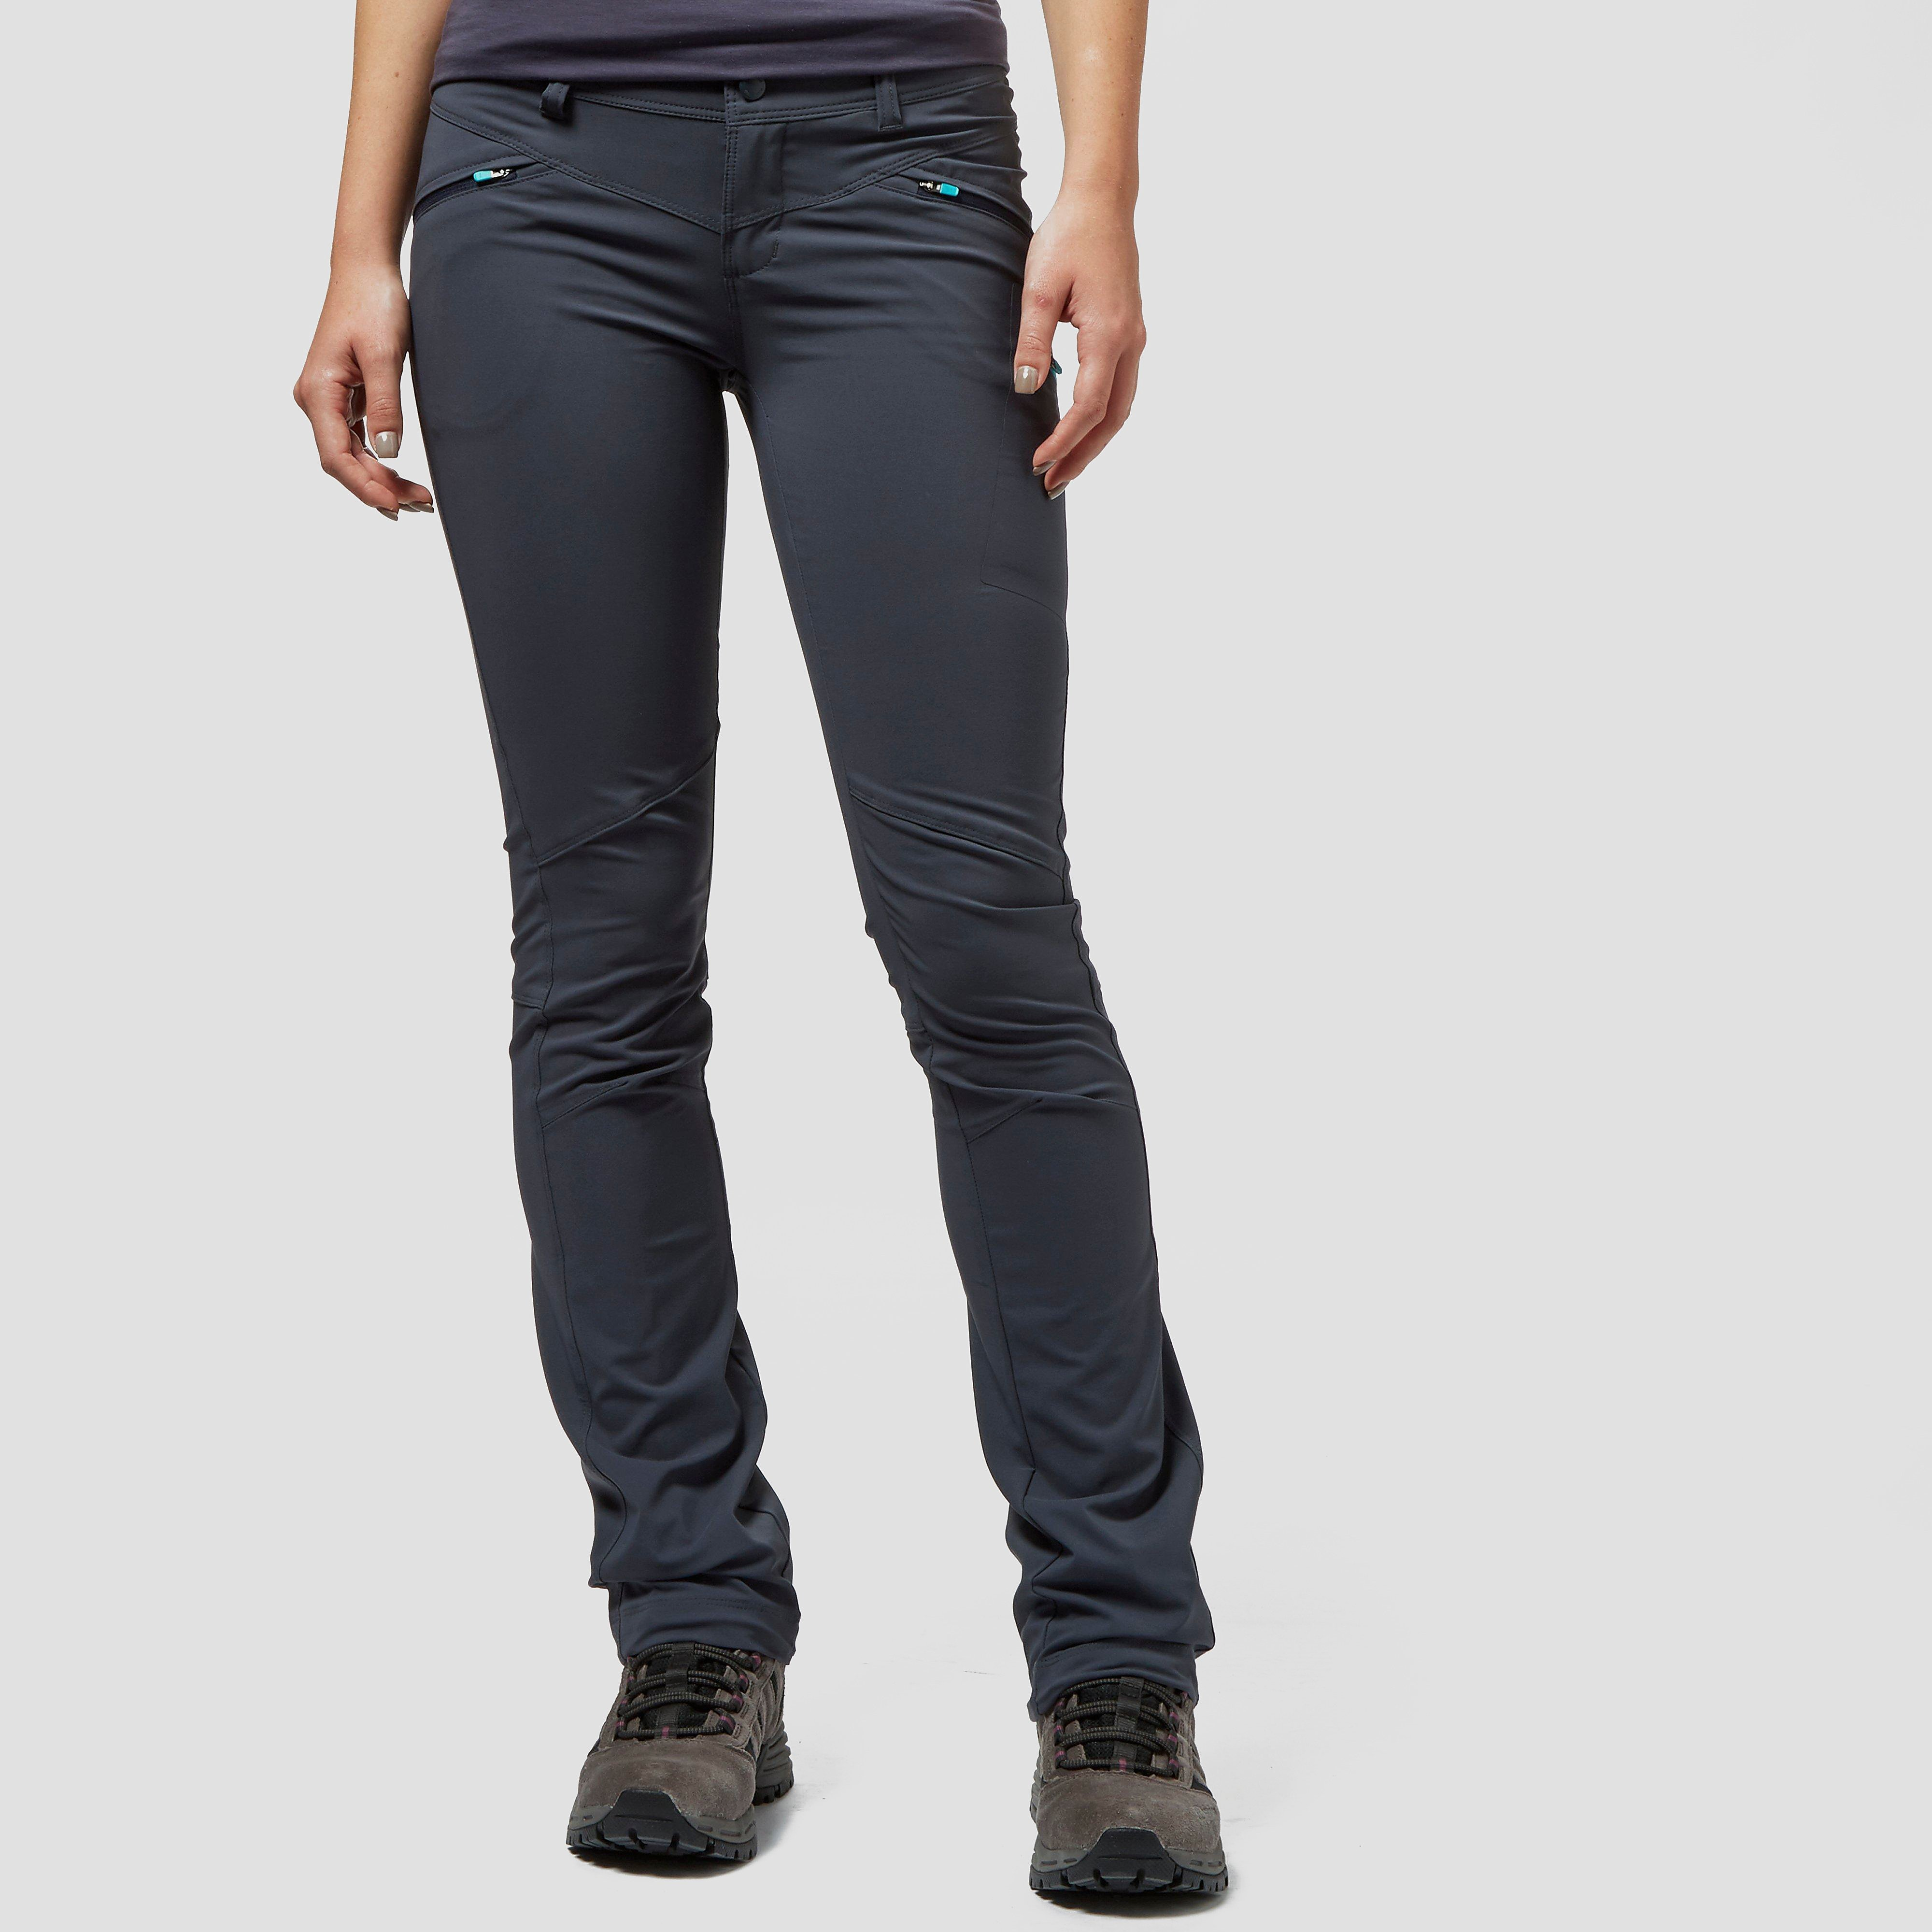 YEDIBASAK Peak to Point Women's Trousers